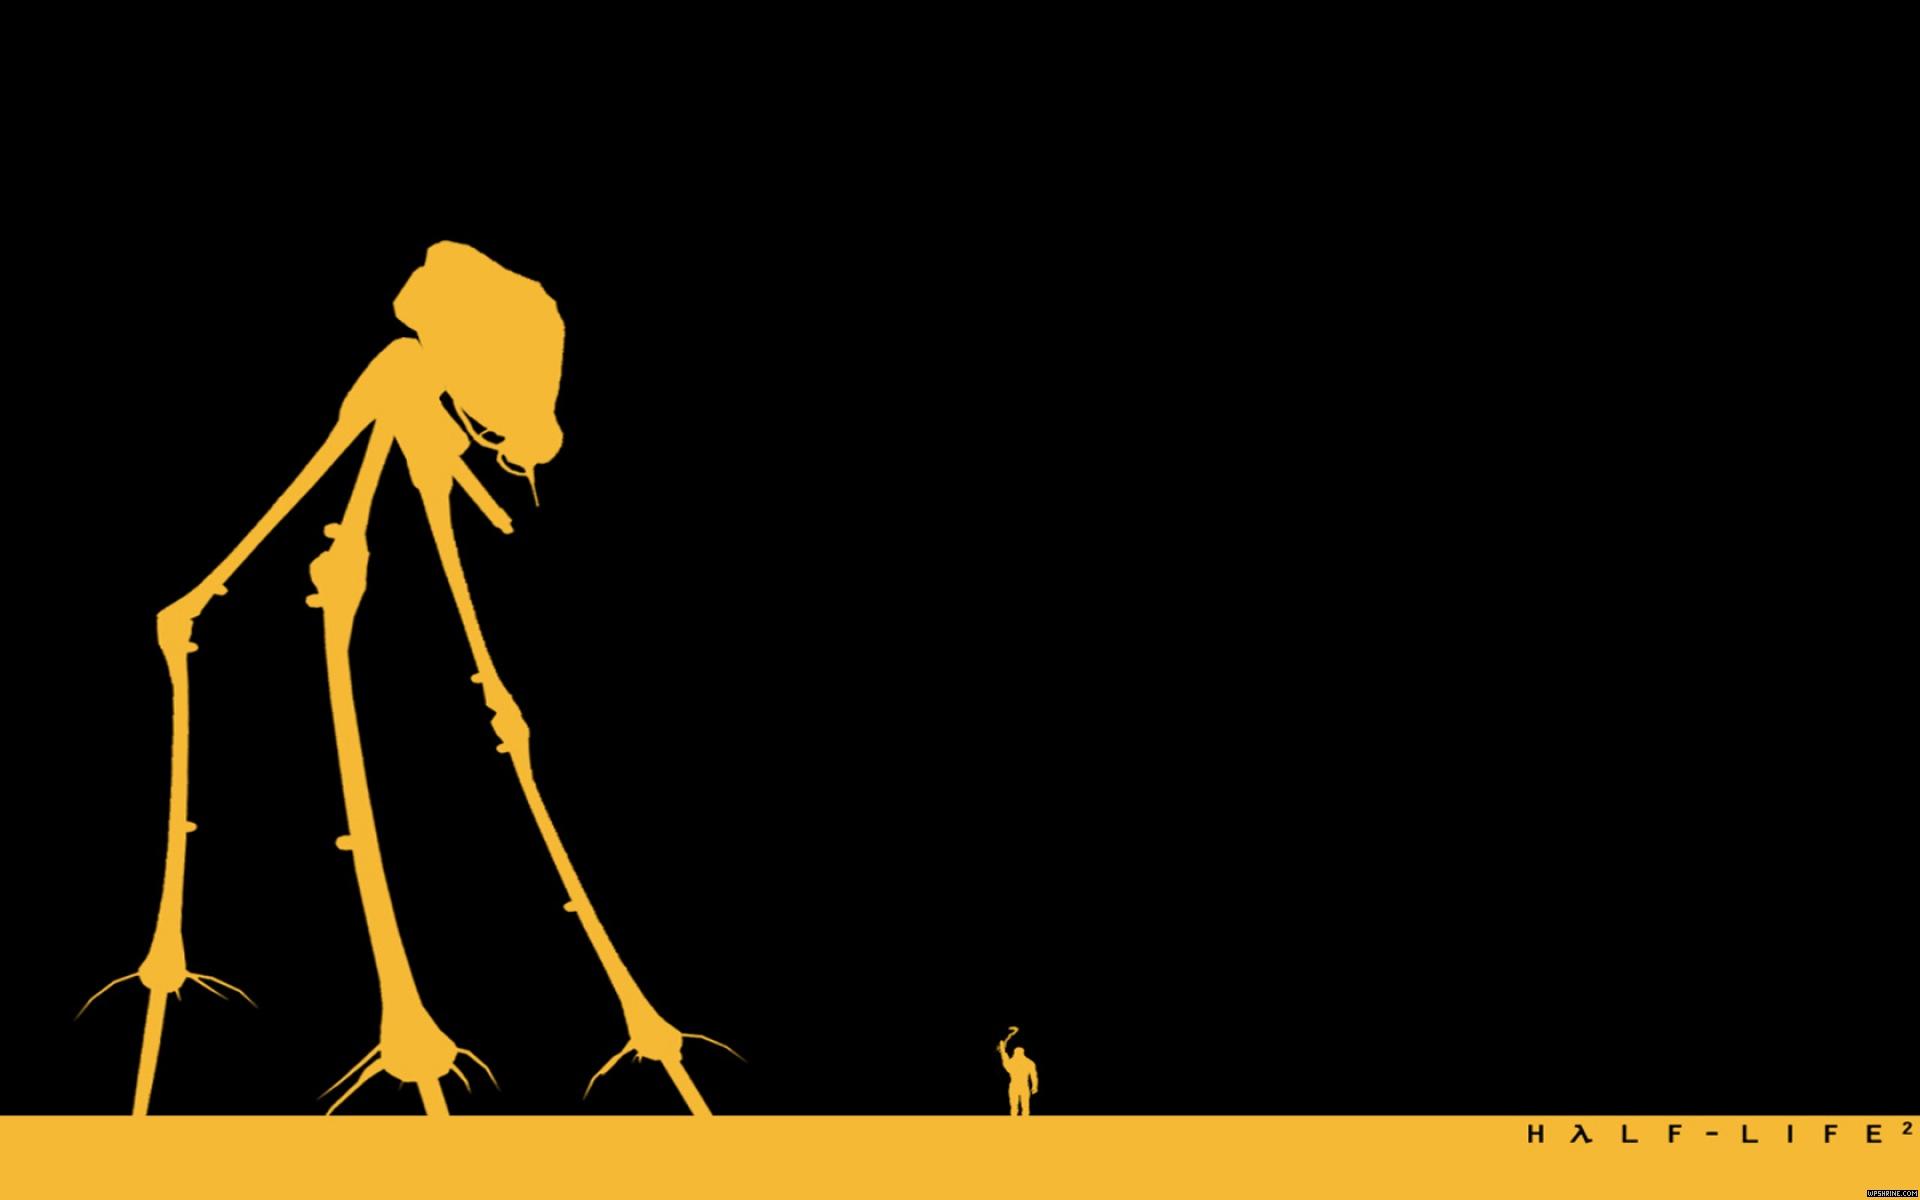 Half Life Res: 1920x1200 / Size:101kb. Views: 4781